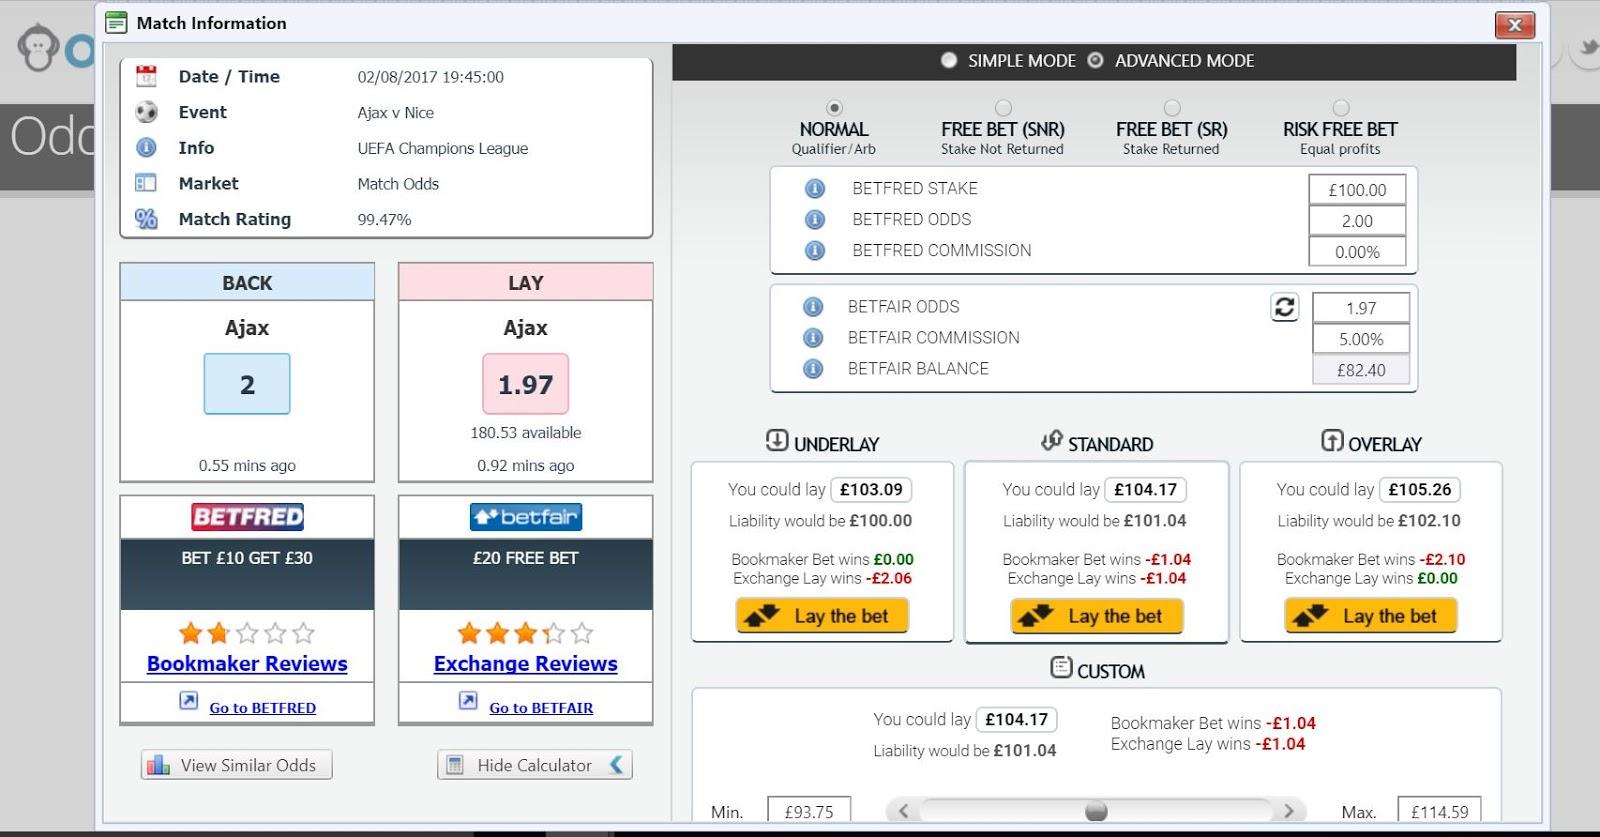 Profit Accumulator vs OddsMonkey - The Matched Betting Choice